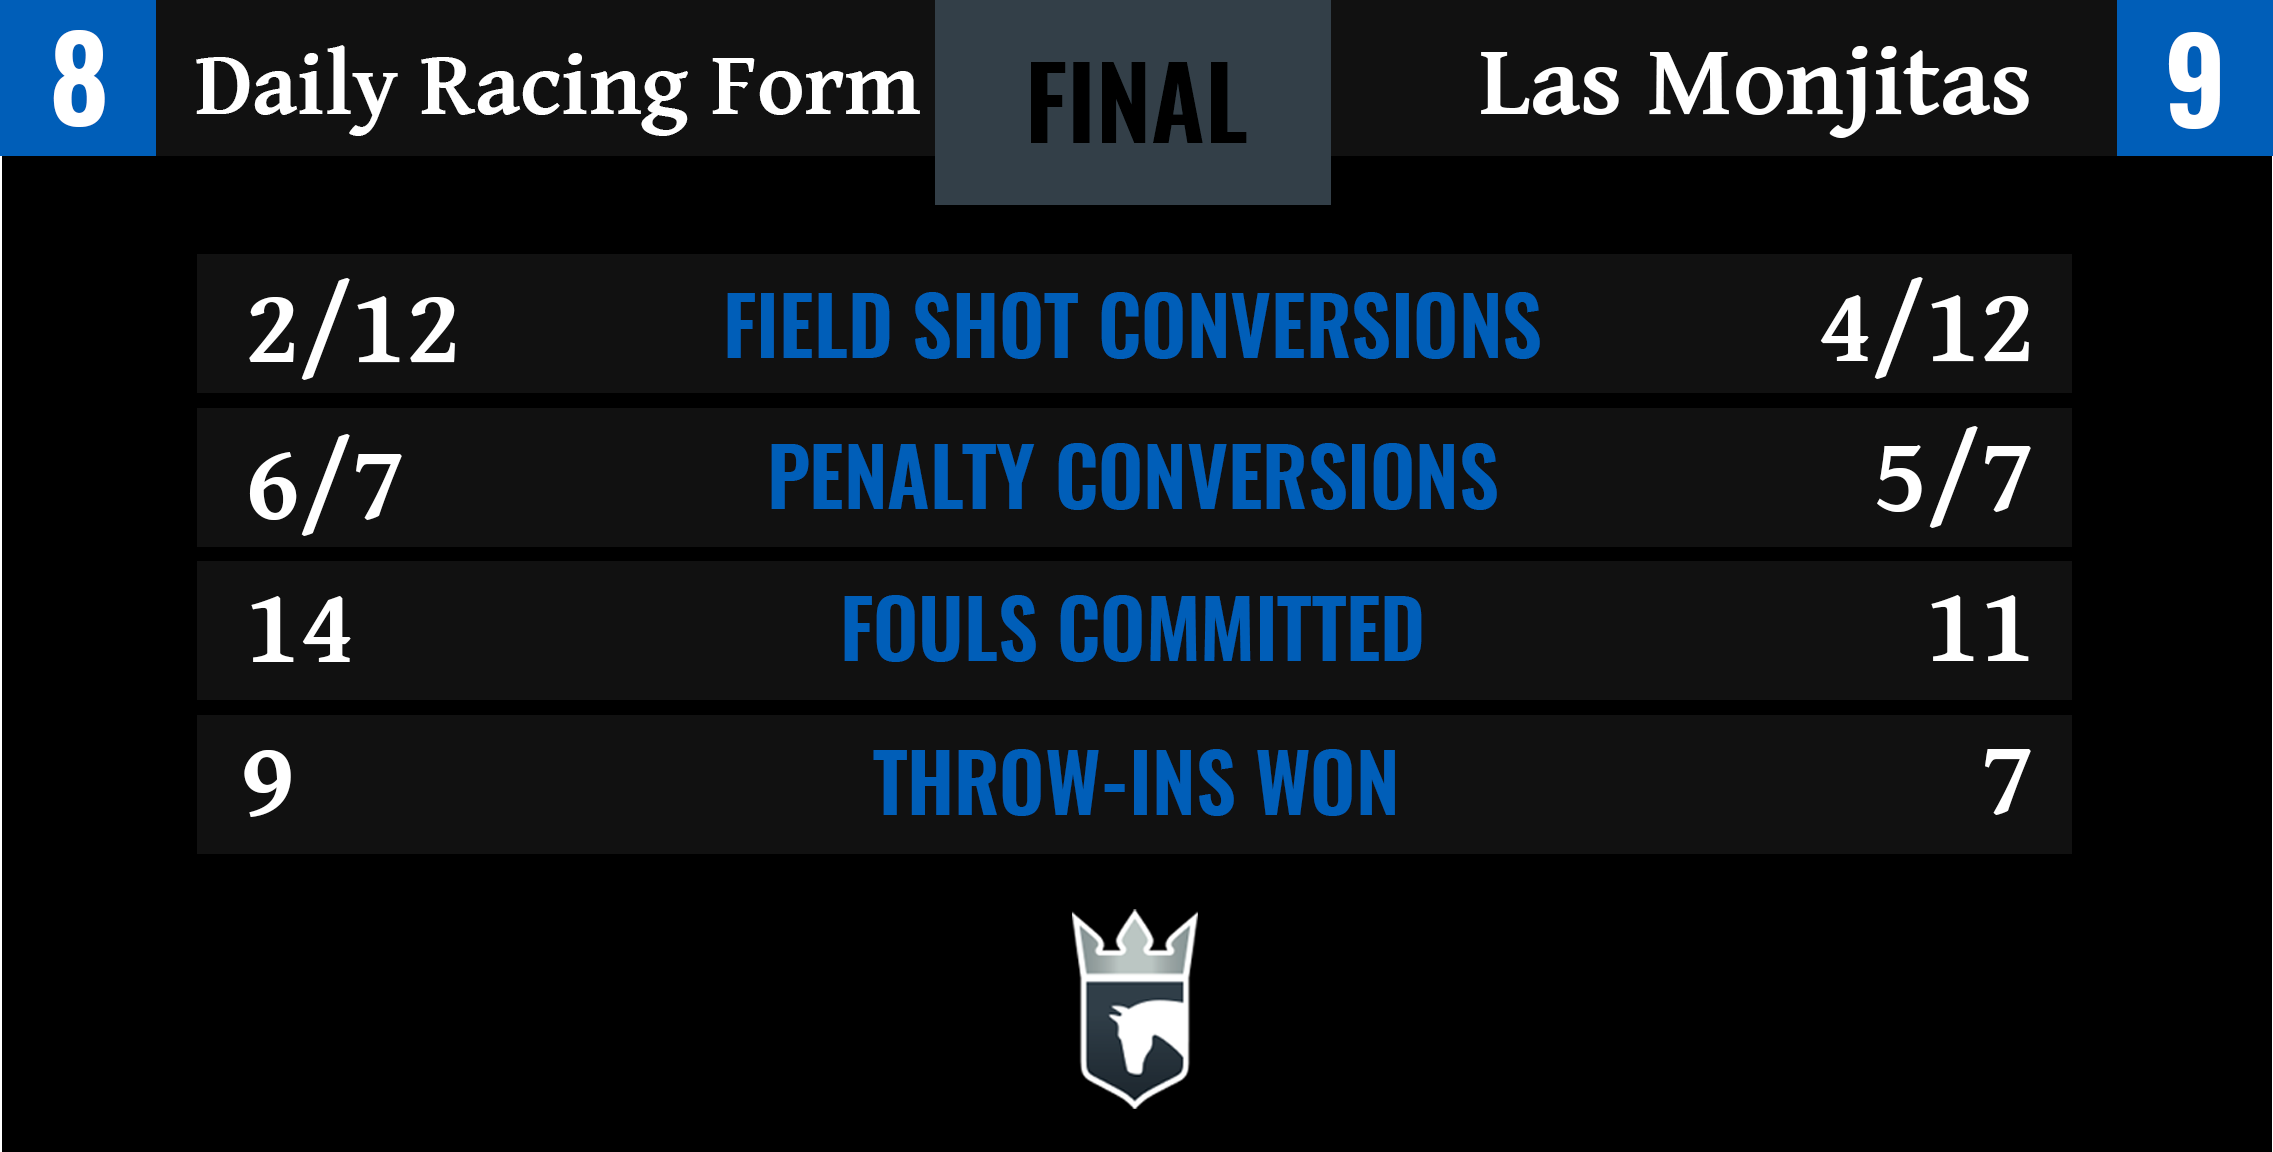 Daily Racing Form vs Las Monjitas Final Stats